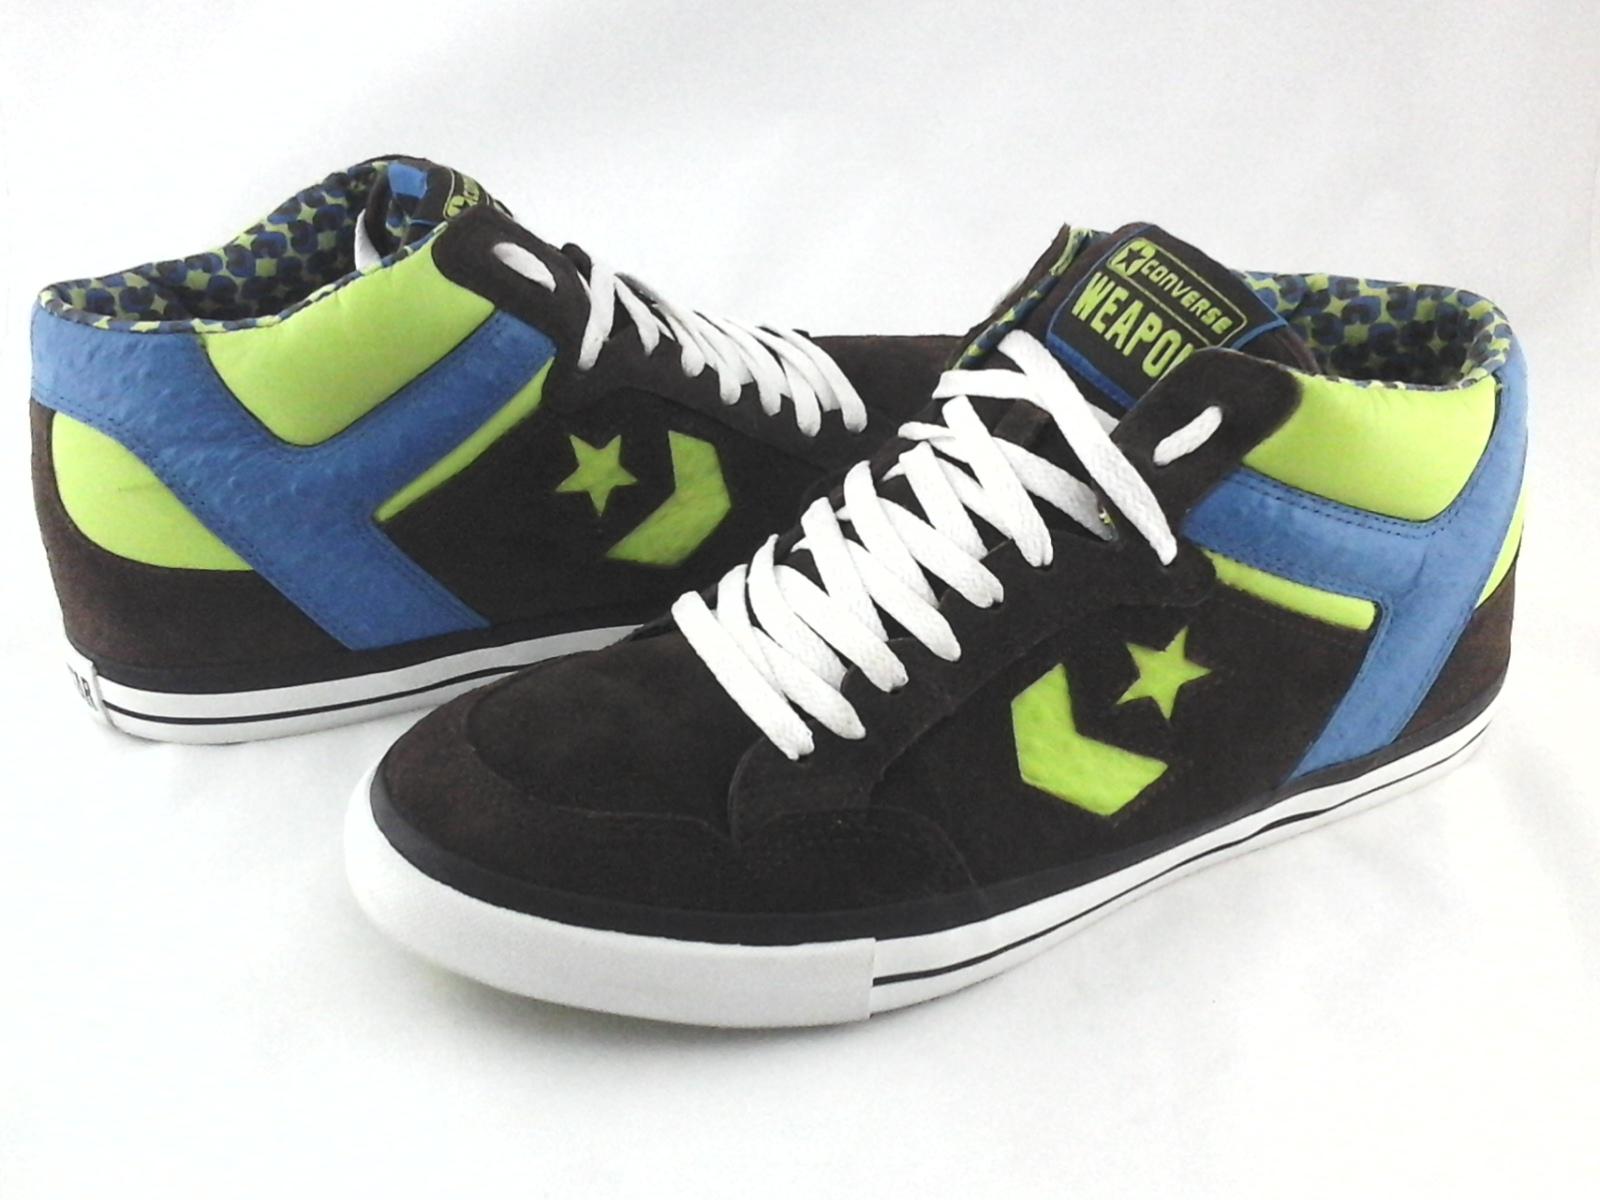 unique design good out x casual shoes Details about CONVERSE Weapon Sneakers Brown Suede w Blue/Green Shoes Mens  US 12 EU 46.5 RARE